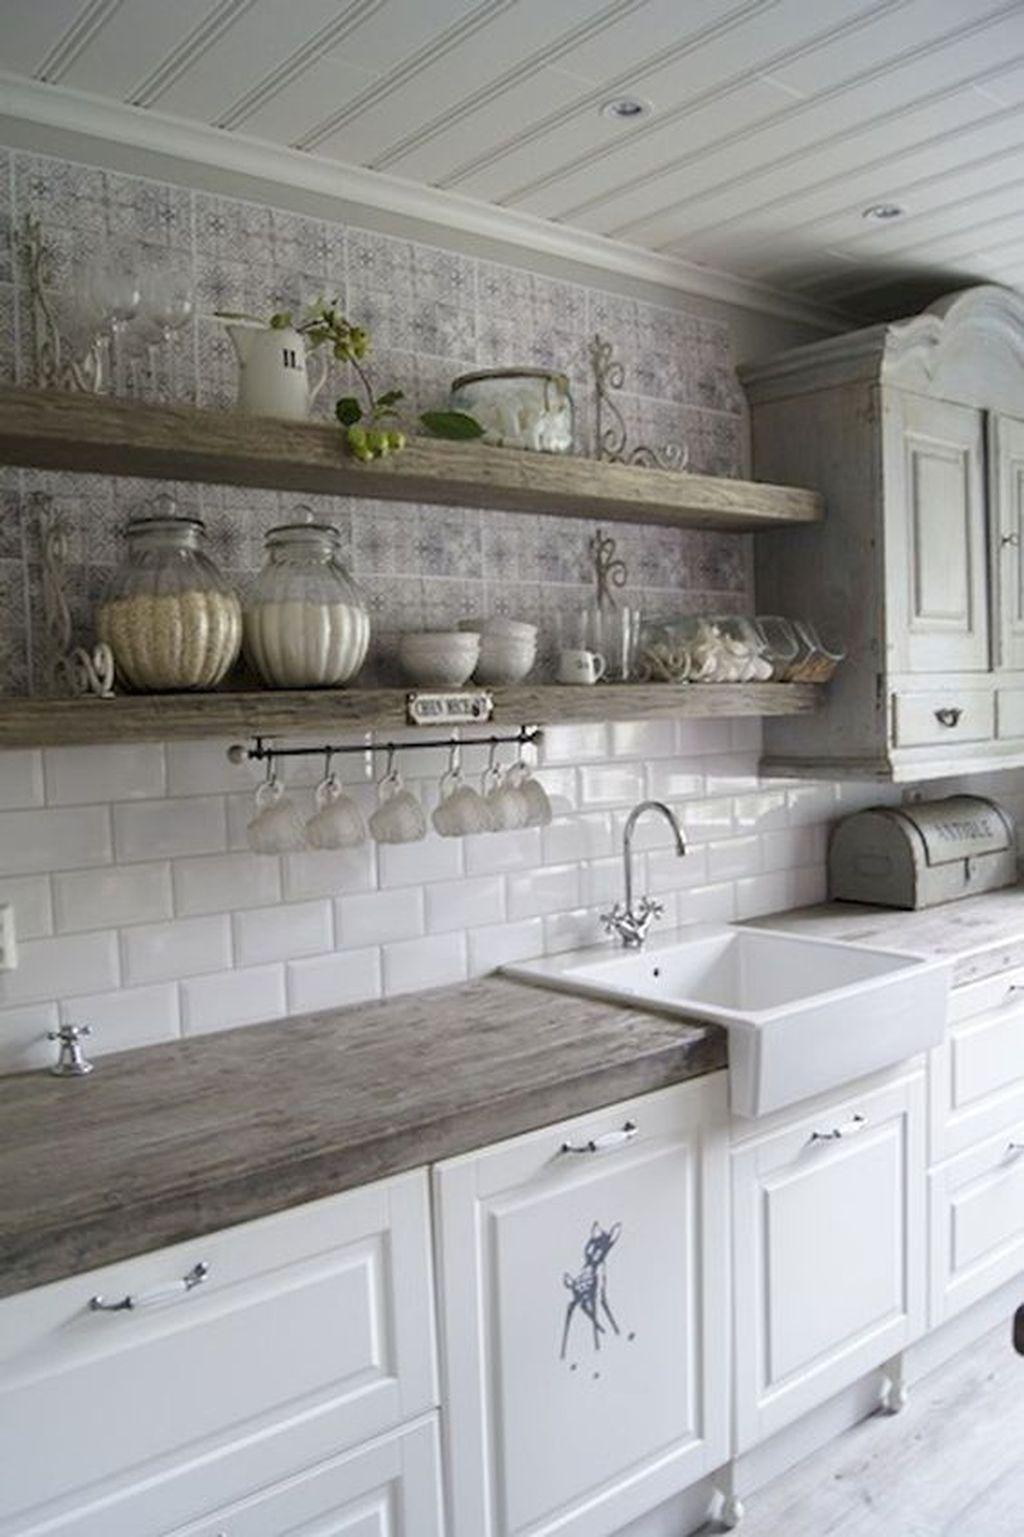 40 Popular Modern Farmhouse Kitchen Backsplash Ideas Popy Home Kitchen Remodel Layout Farmhouse Kitchen Backsplash Kitchen Design